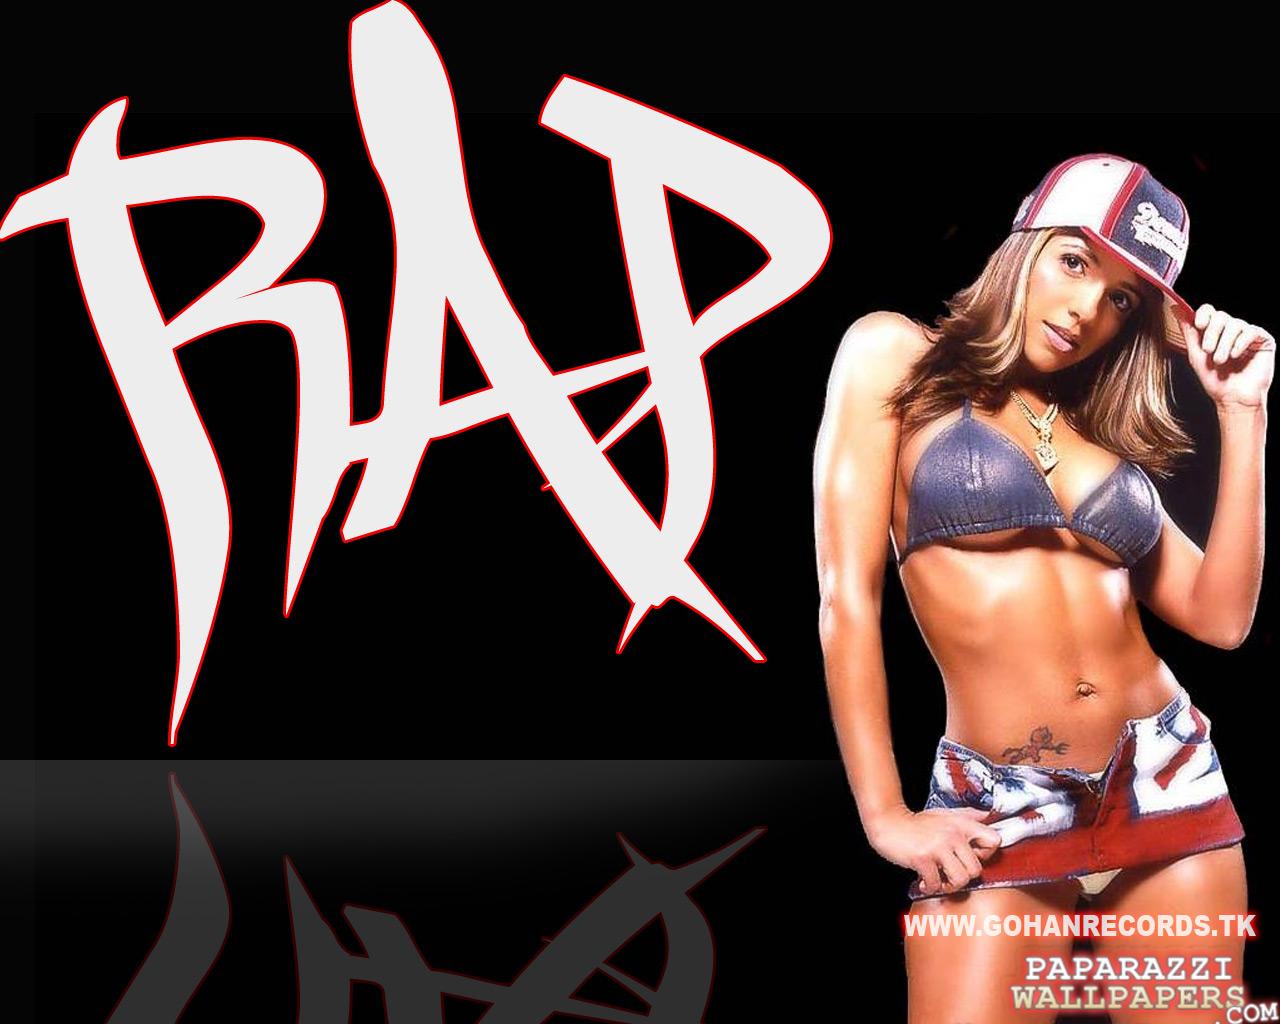 http://3.bp.blogspot.com/-08z13FlgFm4/T8Ts9hfHusI/AAAAAAAAABU/w0_cqDoS11s/s1600/wallpaper_rap_hiphop_30.jpg